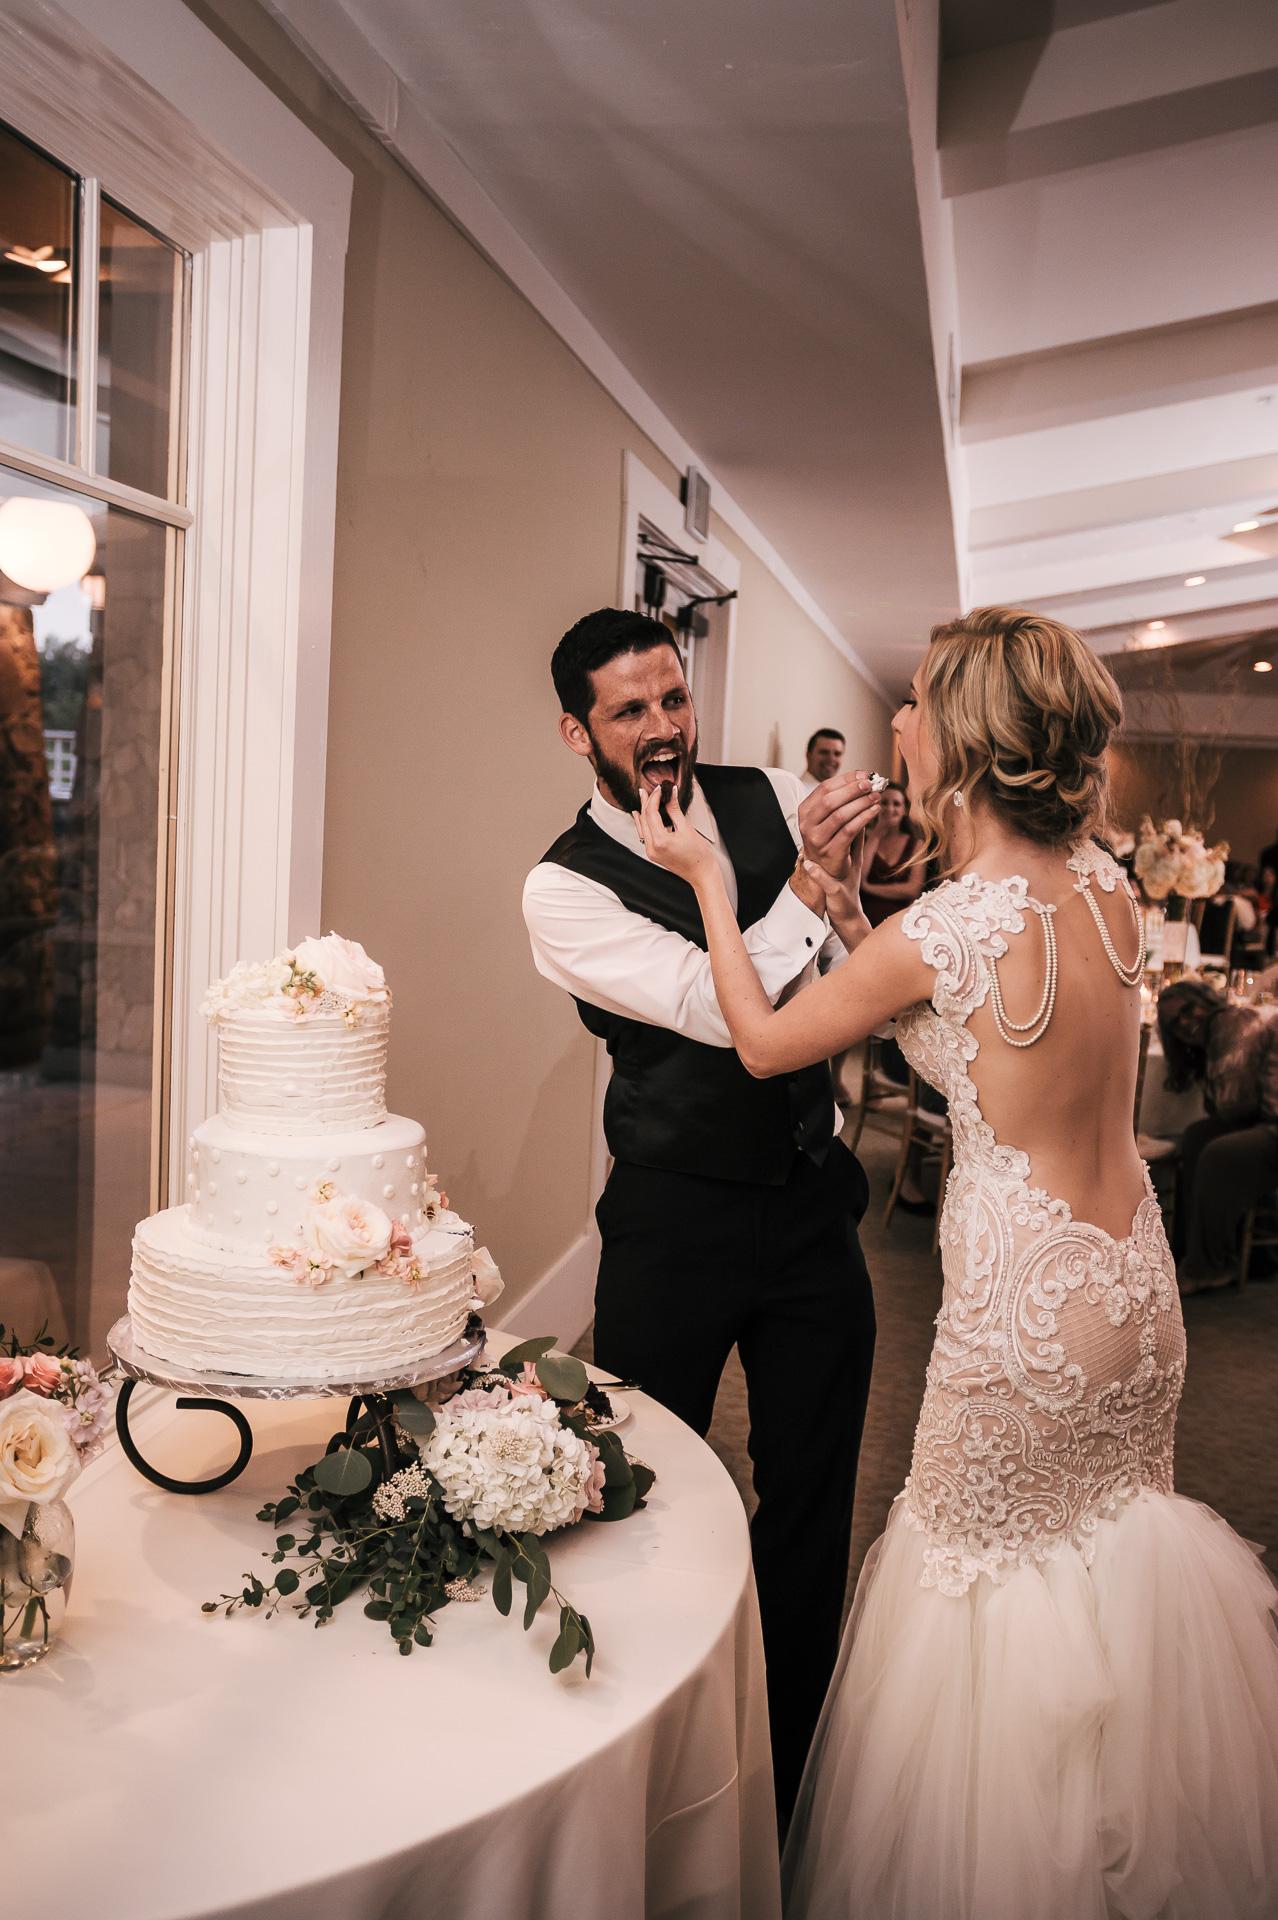 cake cutting at the Twin Oaks Golf Course in San Marcos, San Diegos premier wedding venue